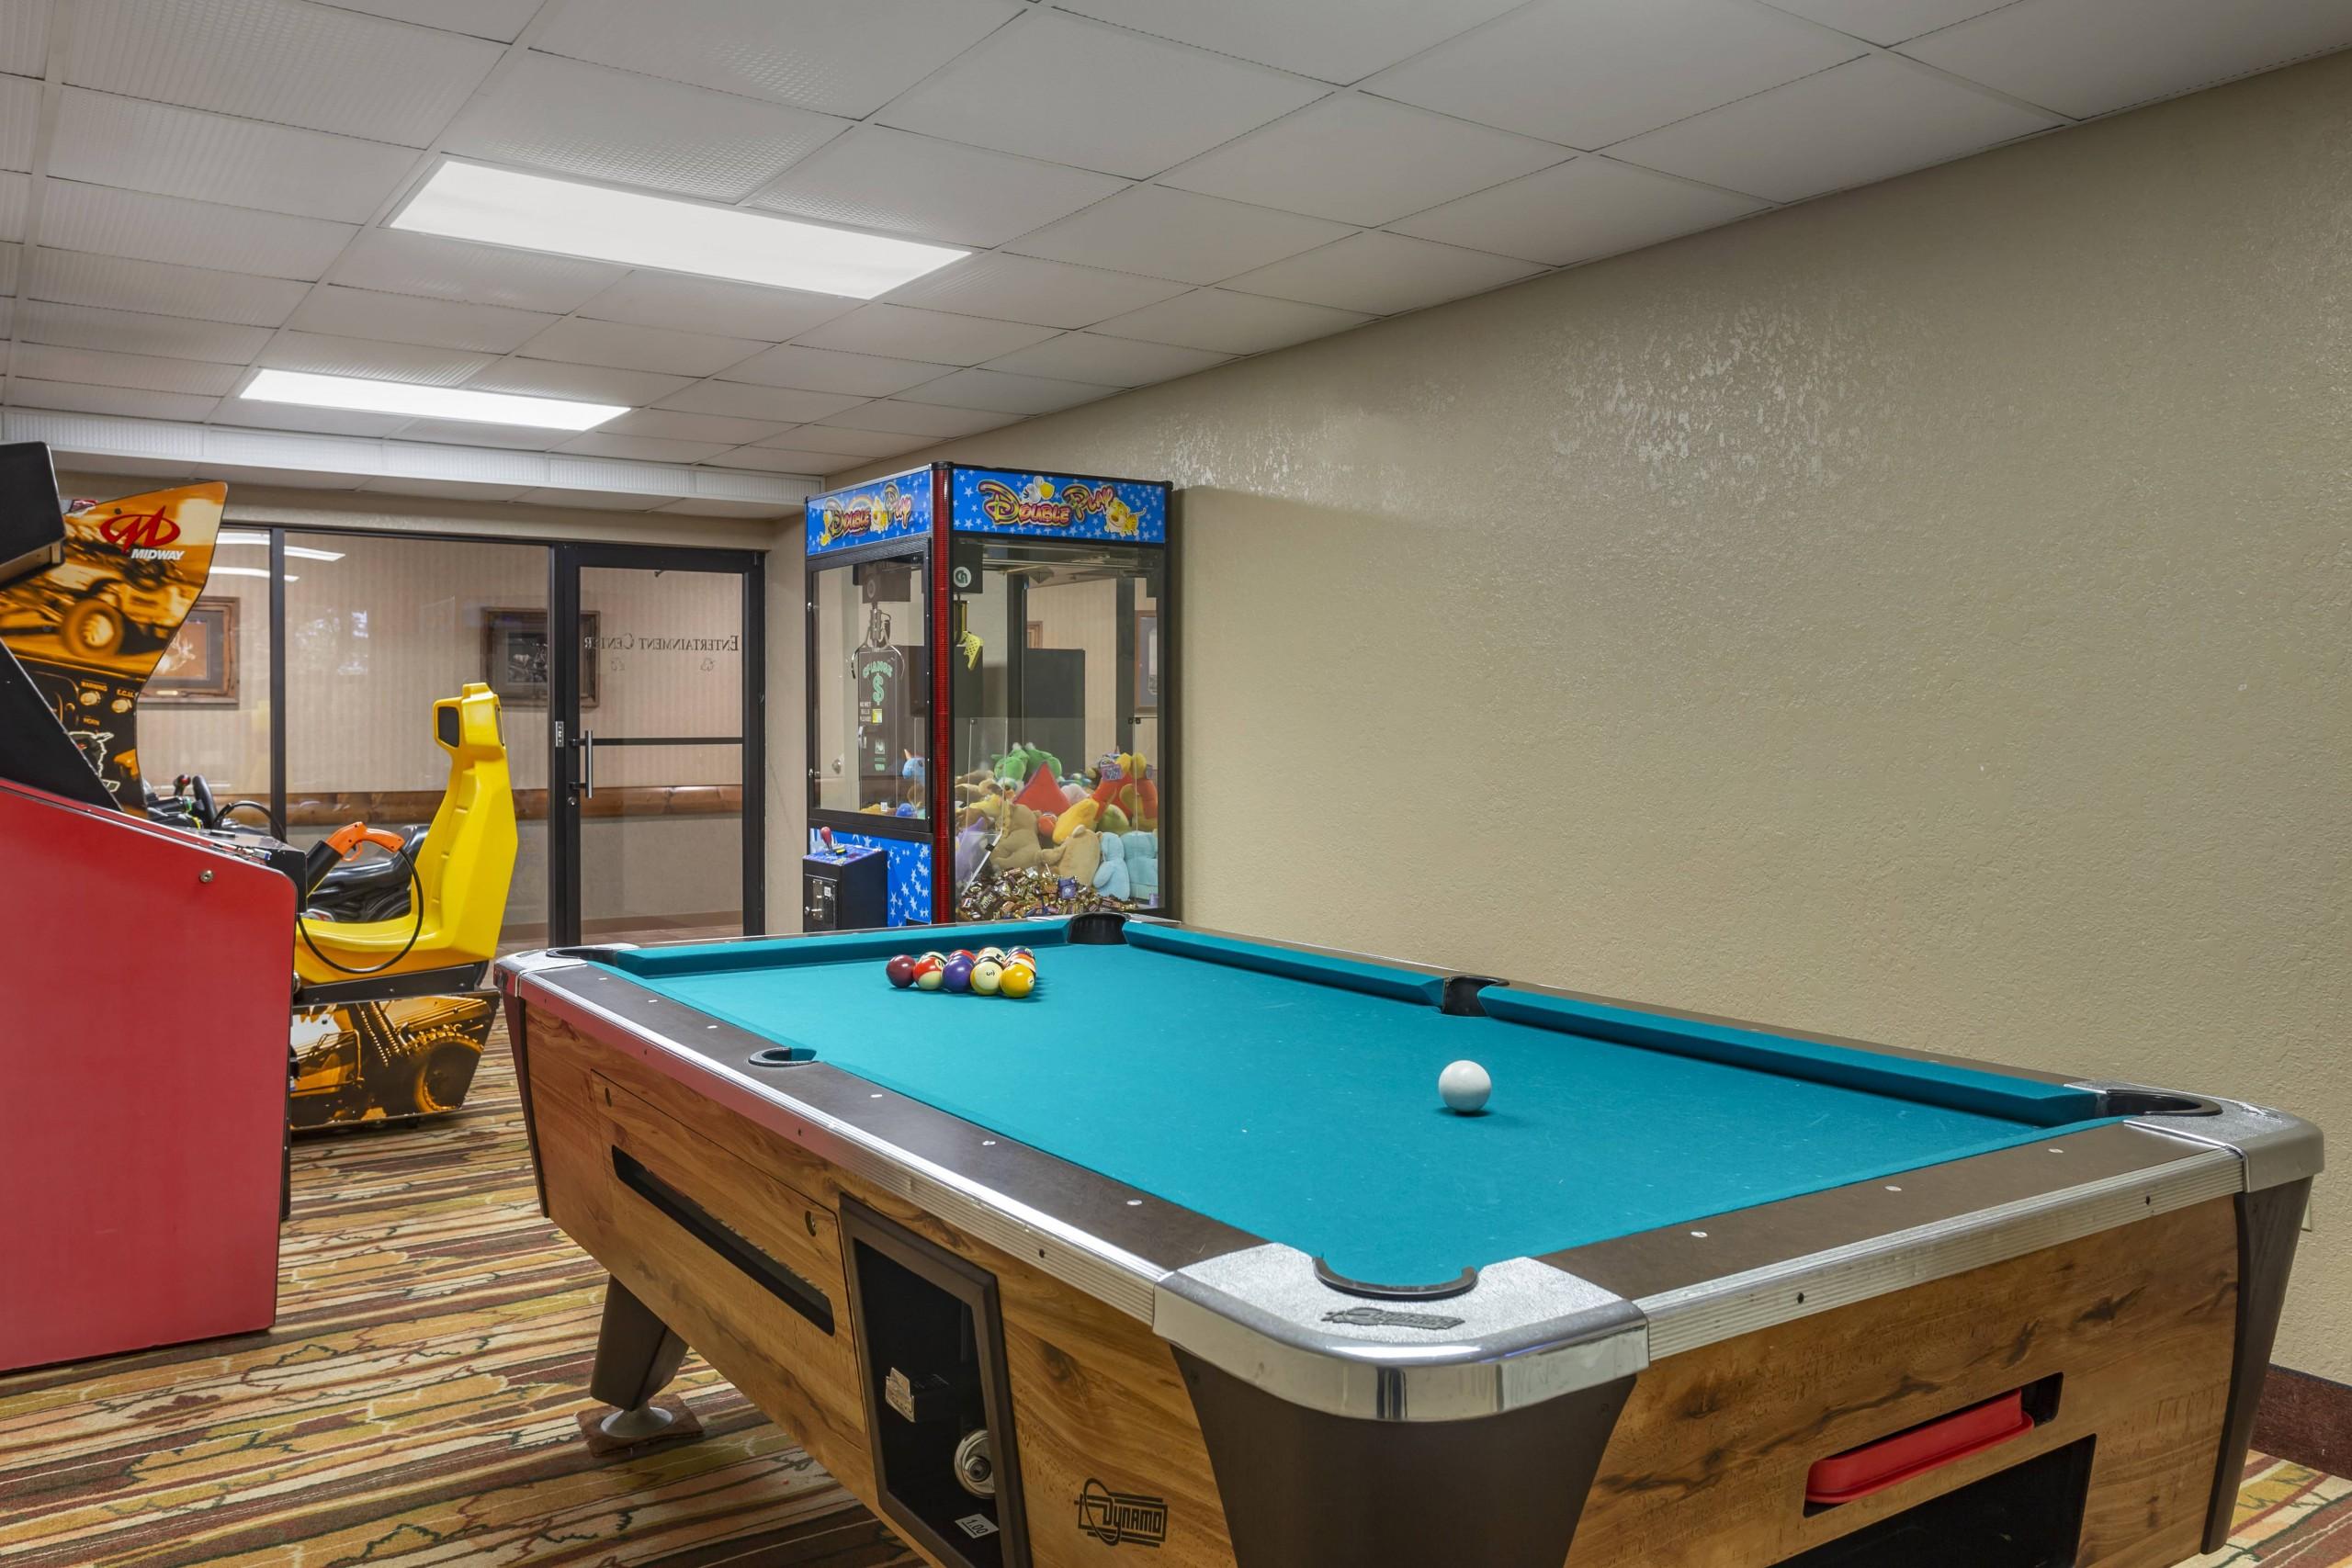 Comfort Inn & Suites Branson Meadows Game Room